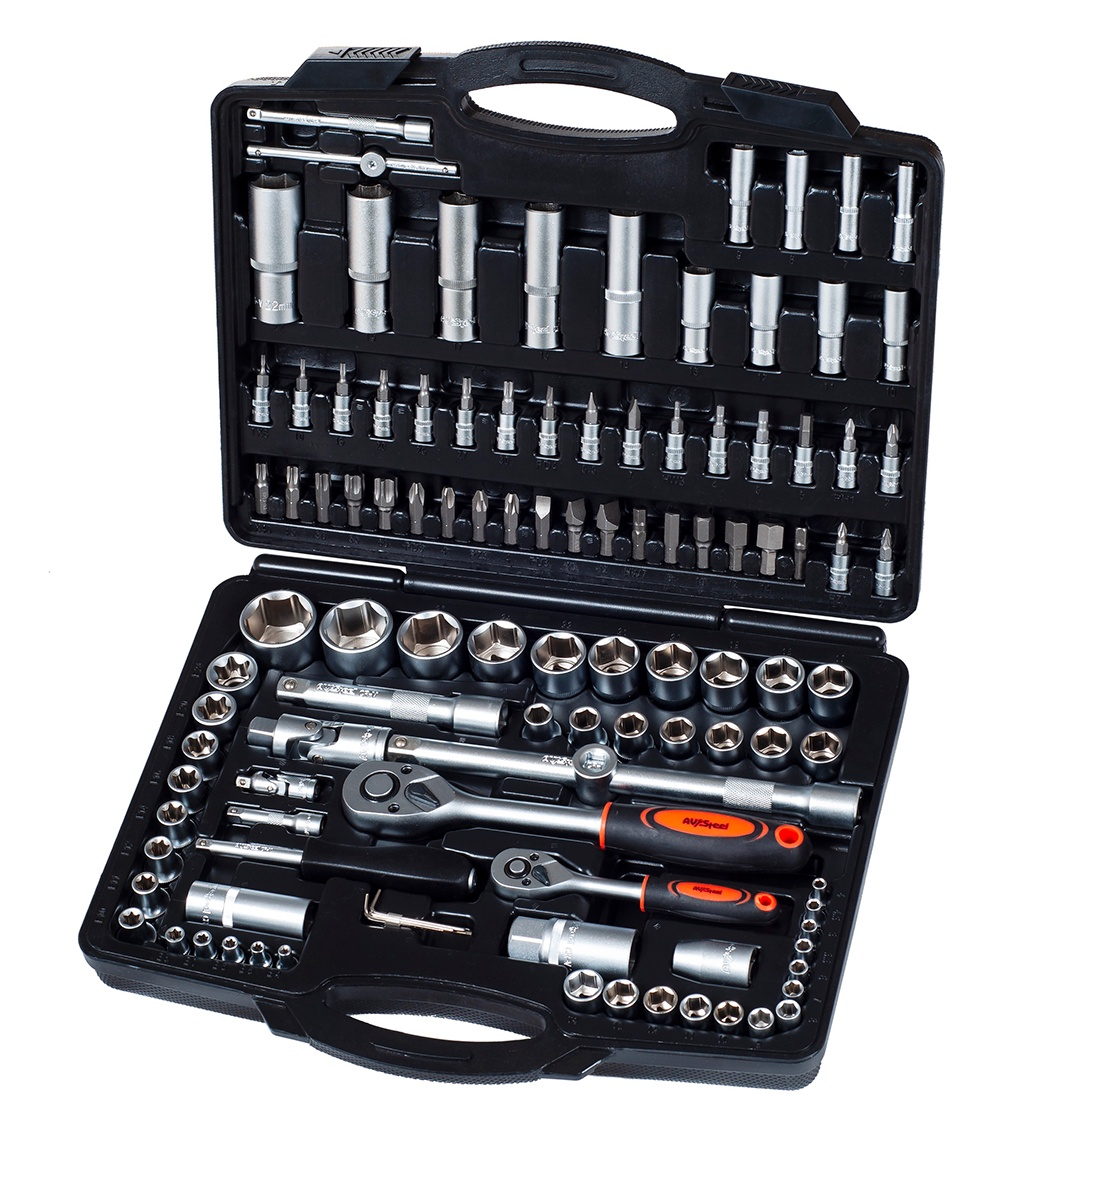 Набор инструментов AV Steel AV-011094 переходник головка 0 11161 со шлангом sks 11161 av presta